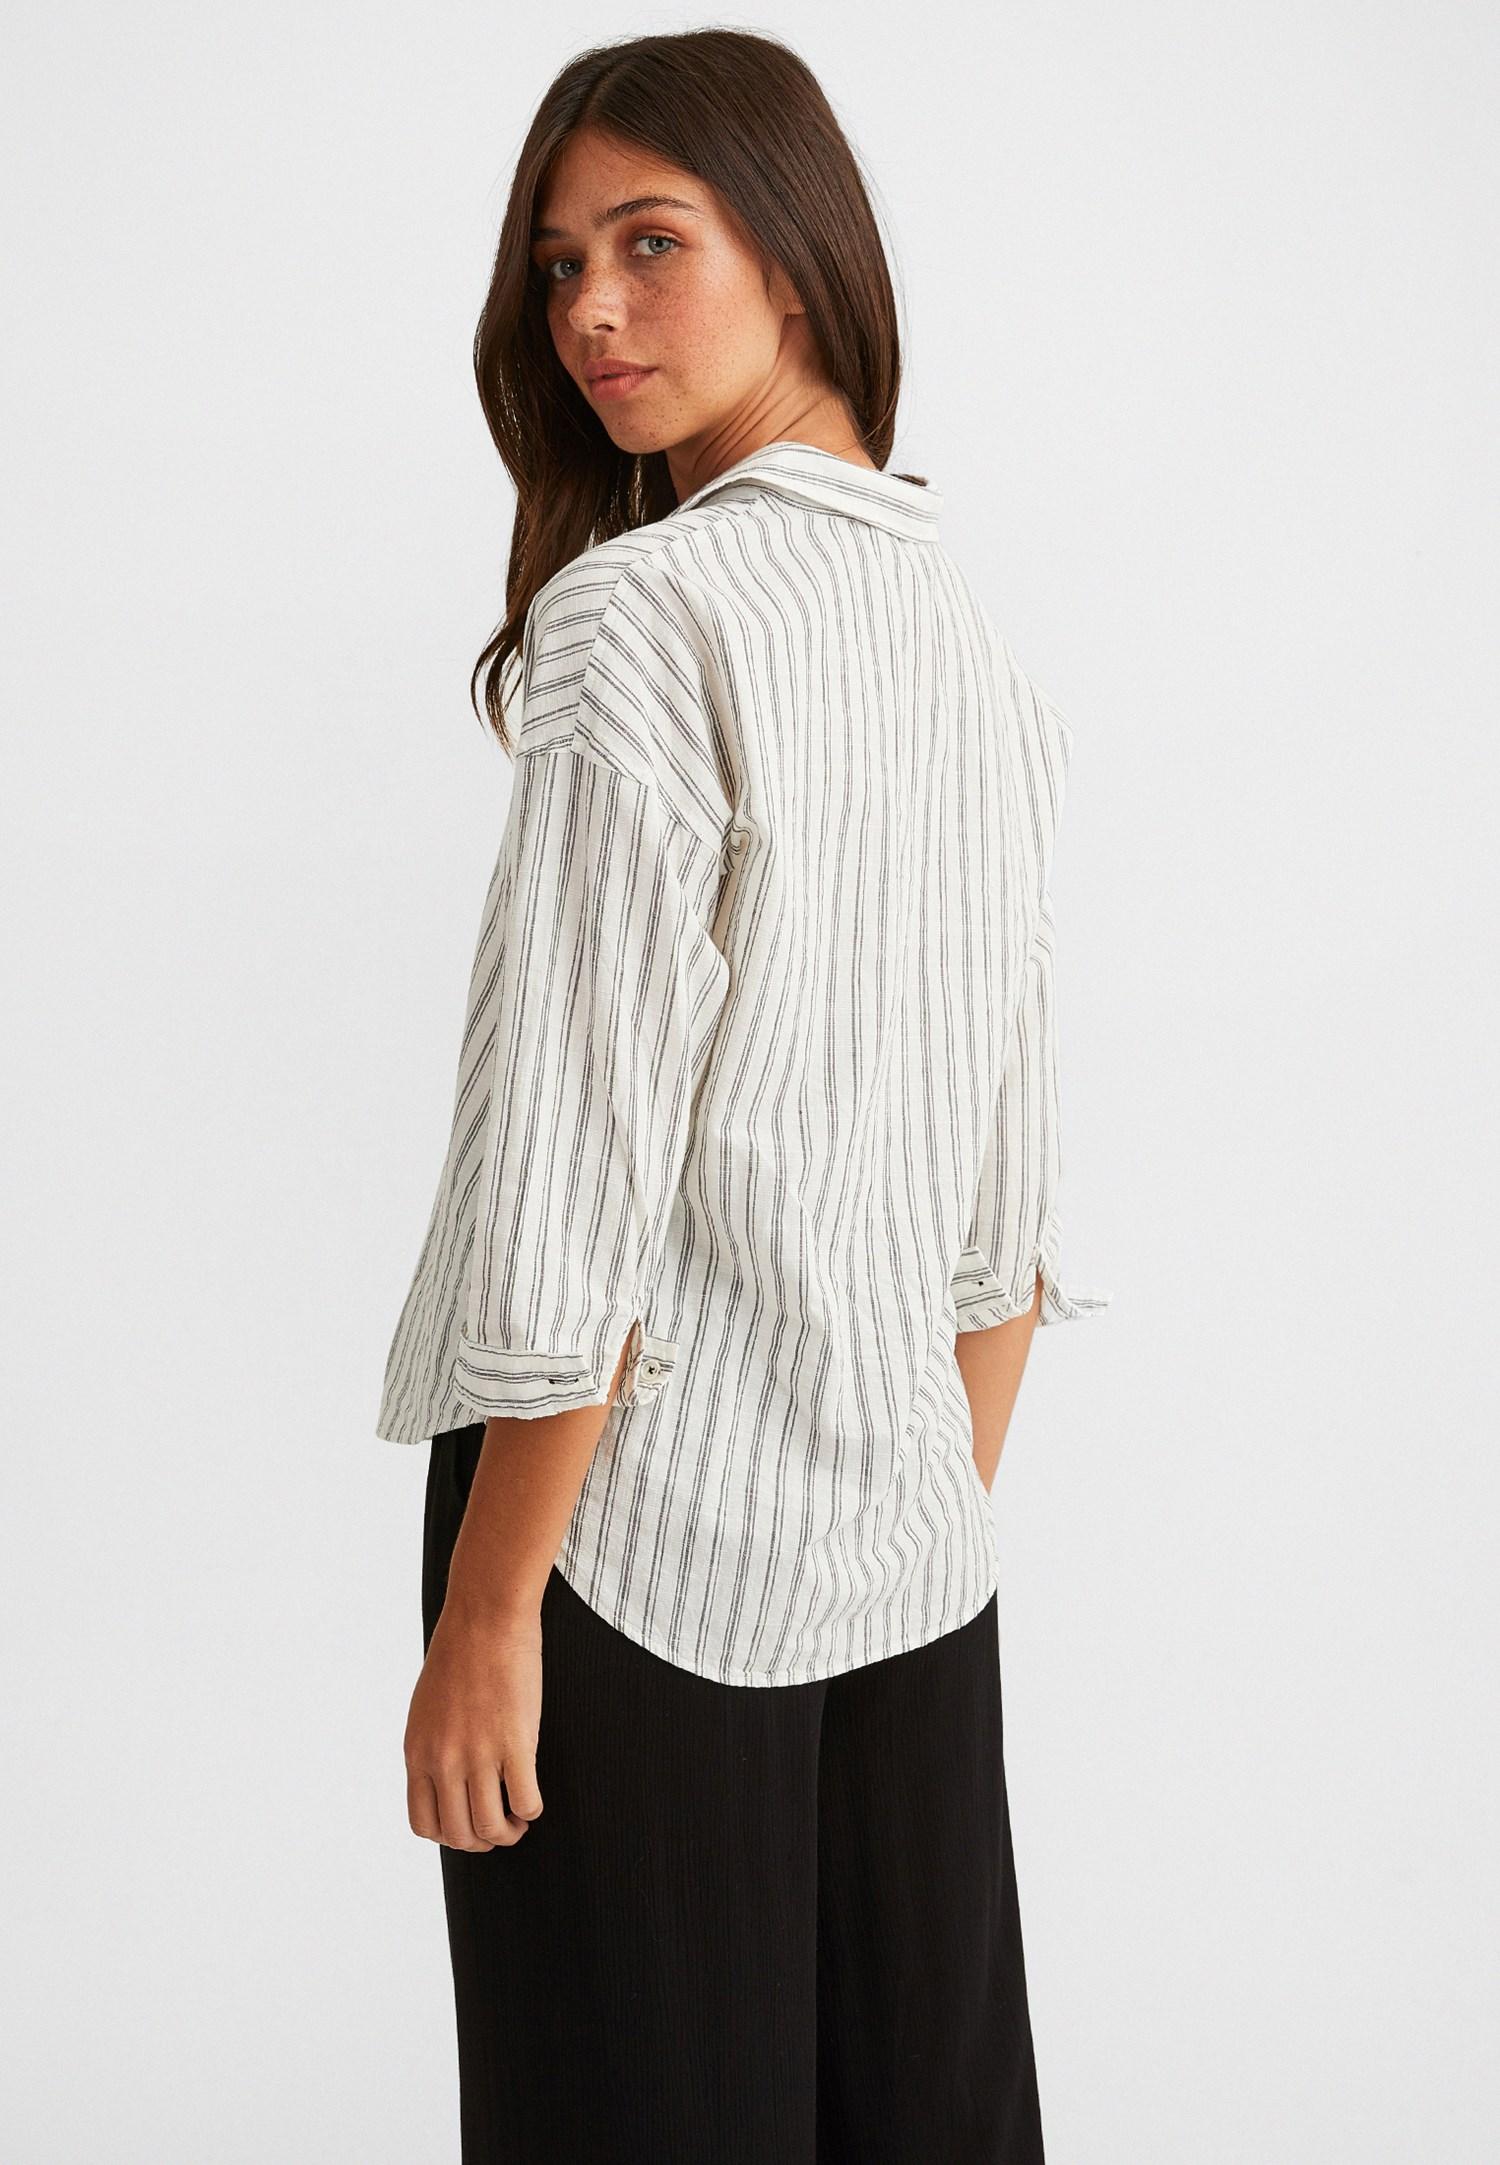 Bayan Siyah Çizgi Desenli Pamuklu Bol Gömlek